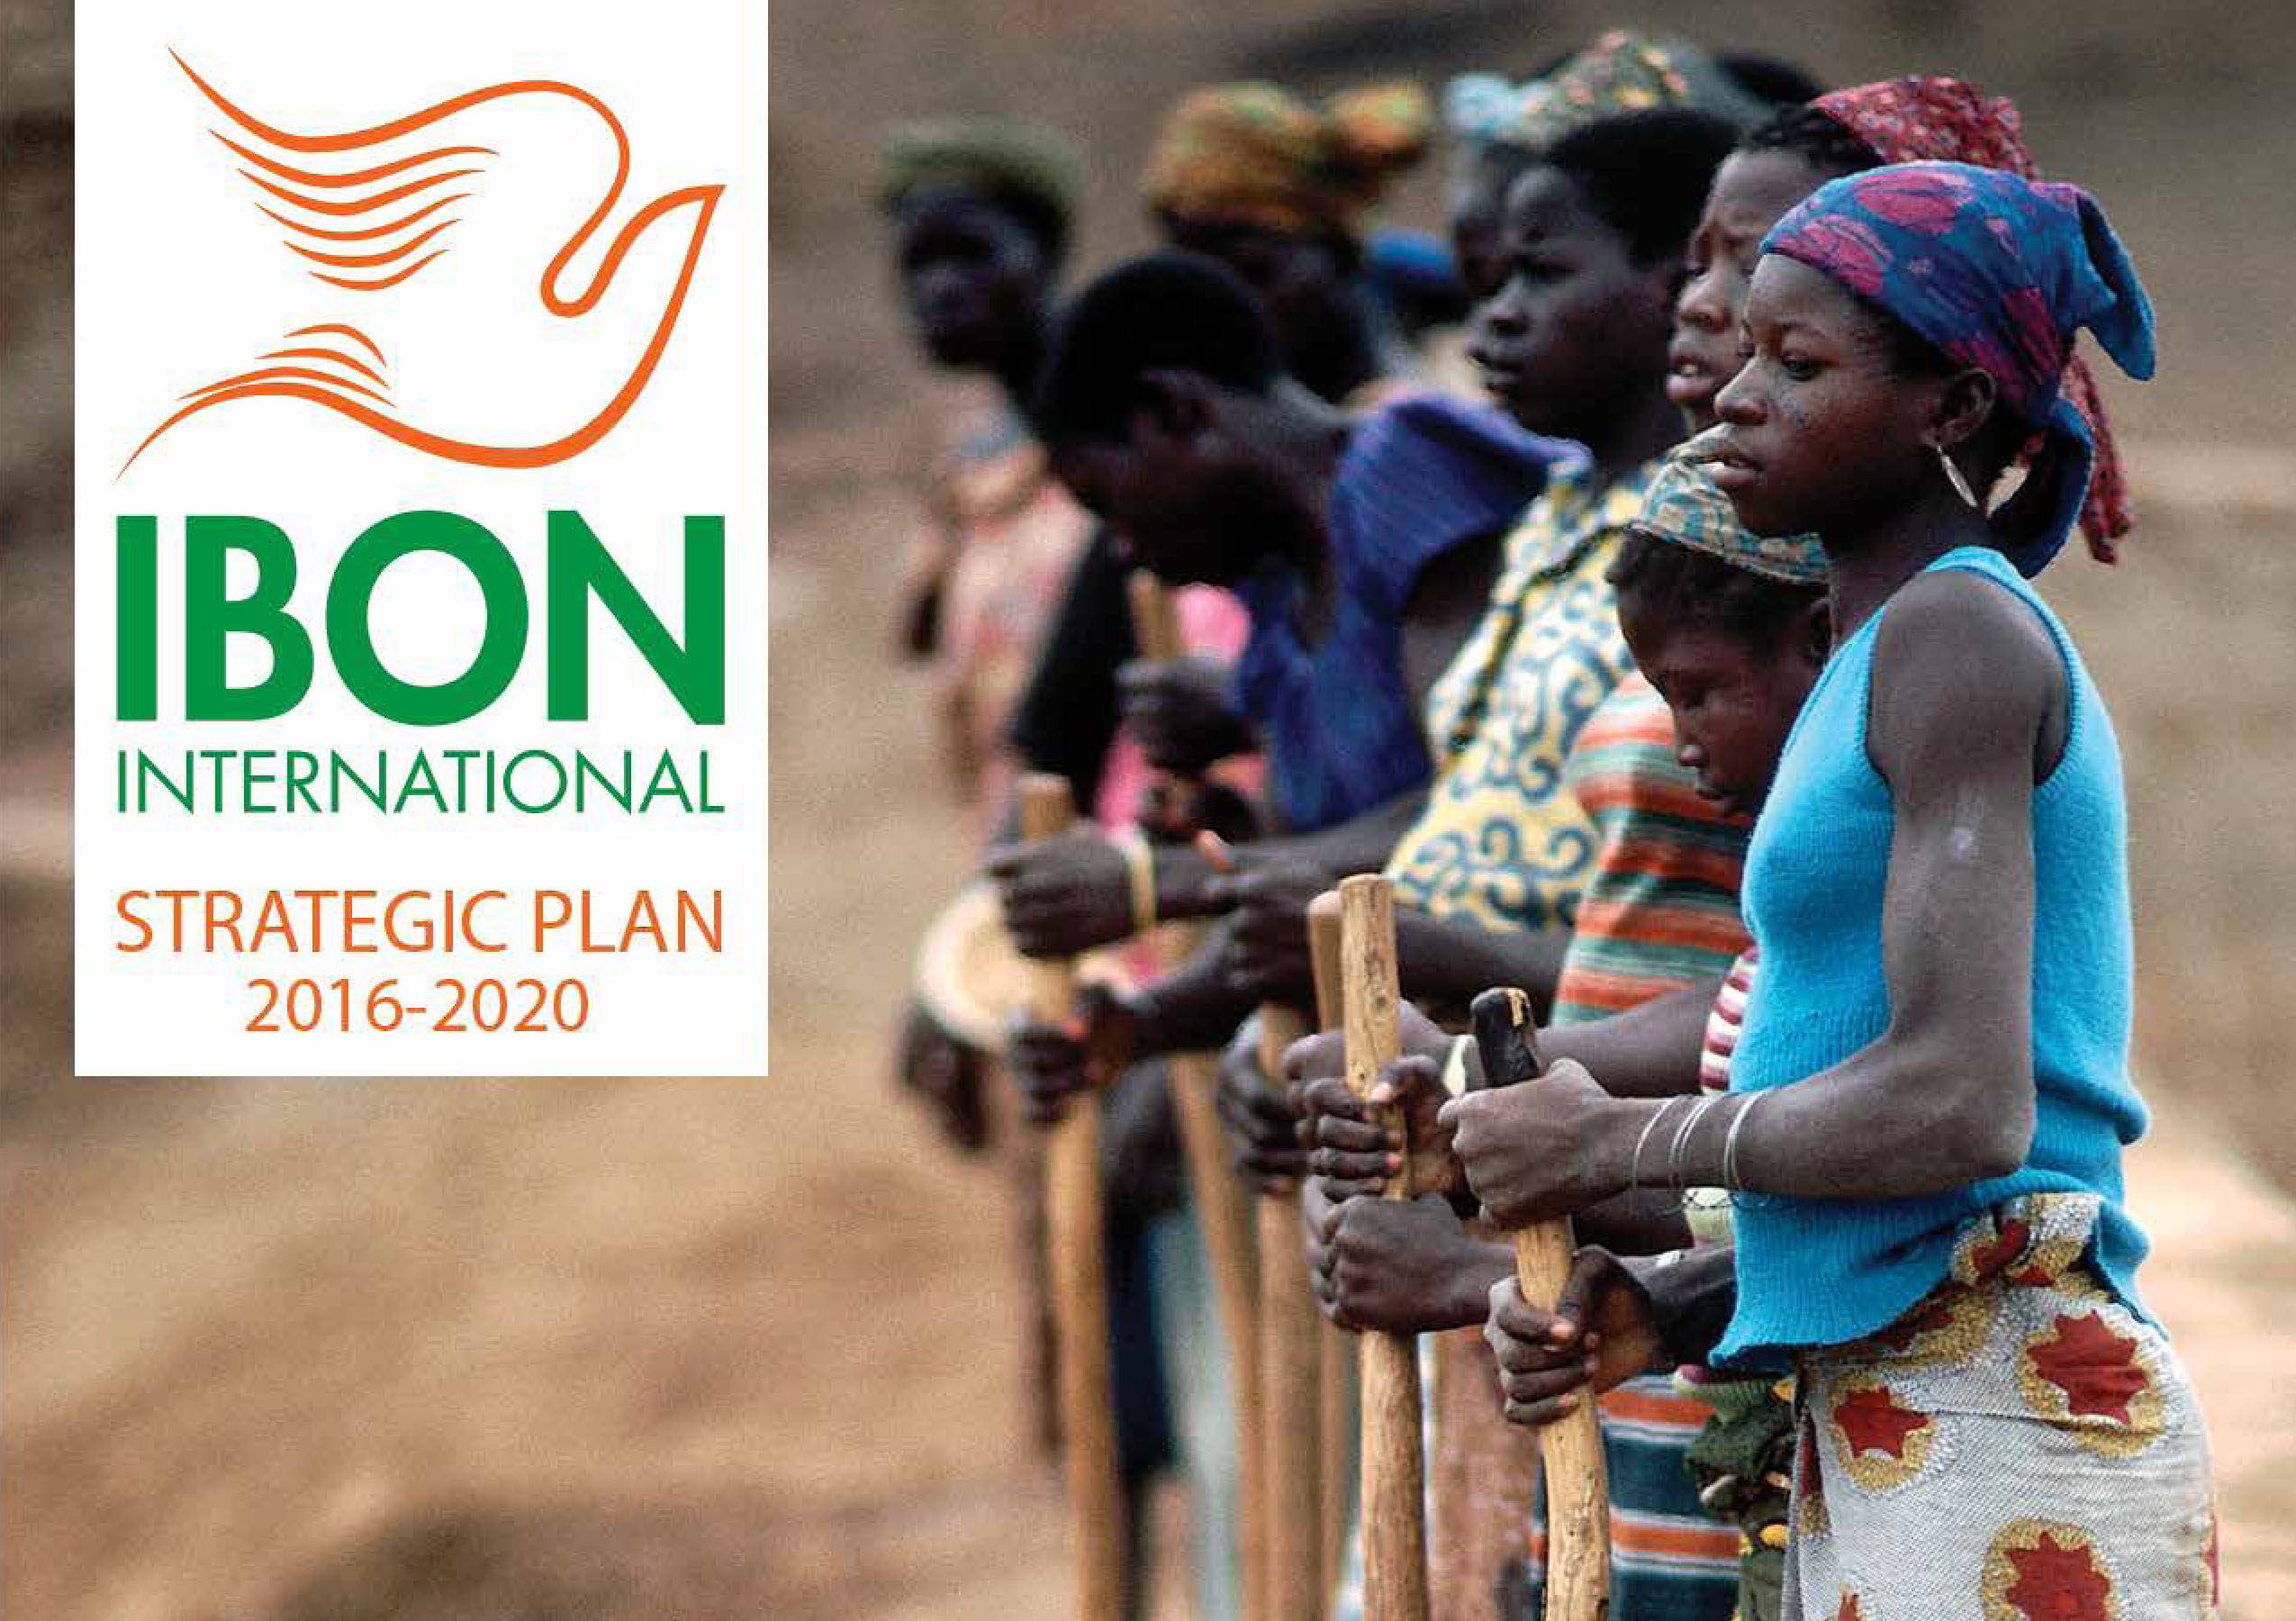 IBON International Strategic Plan 2016-2020